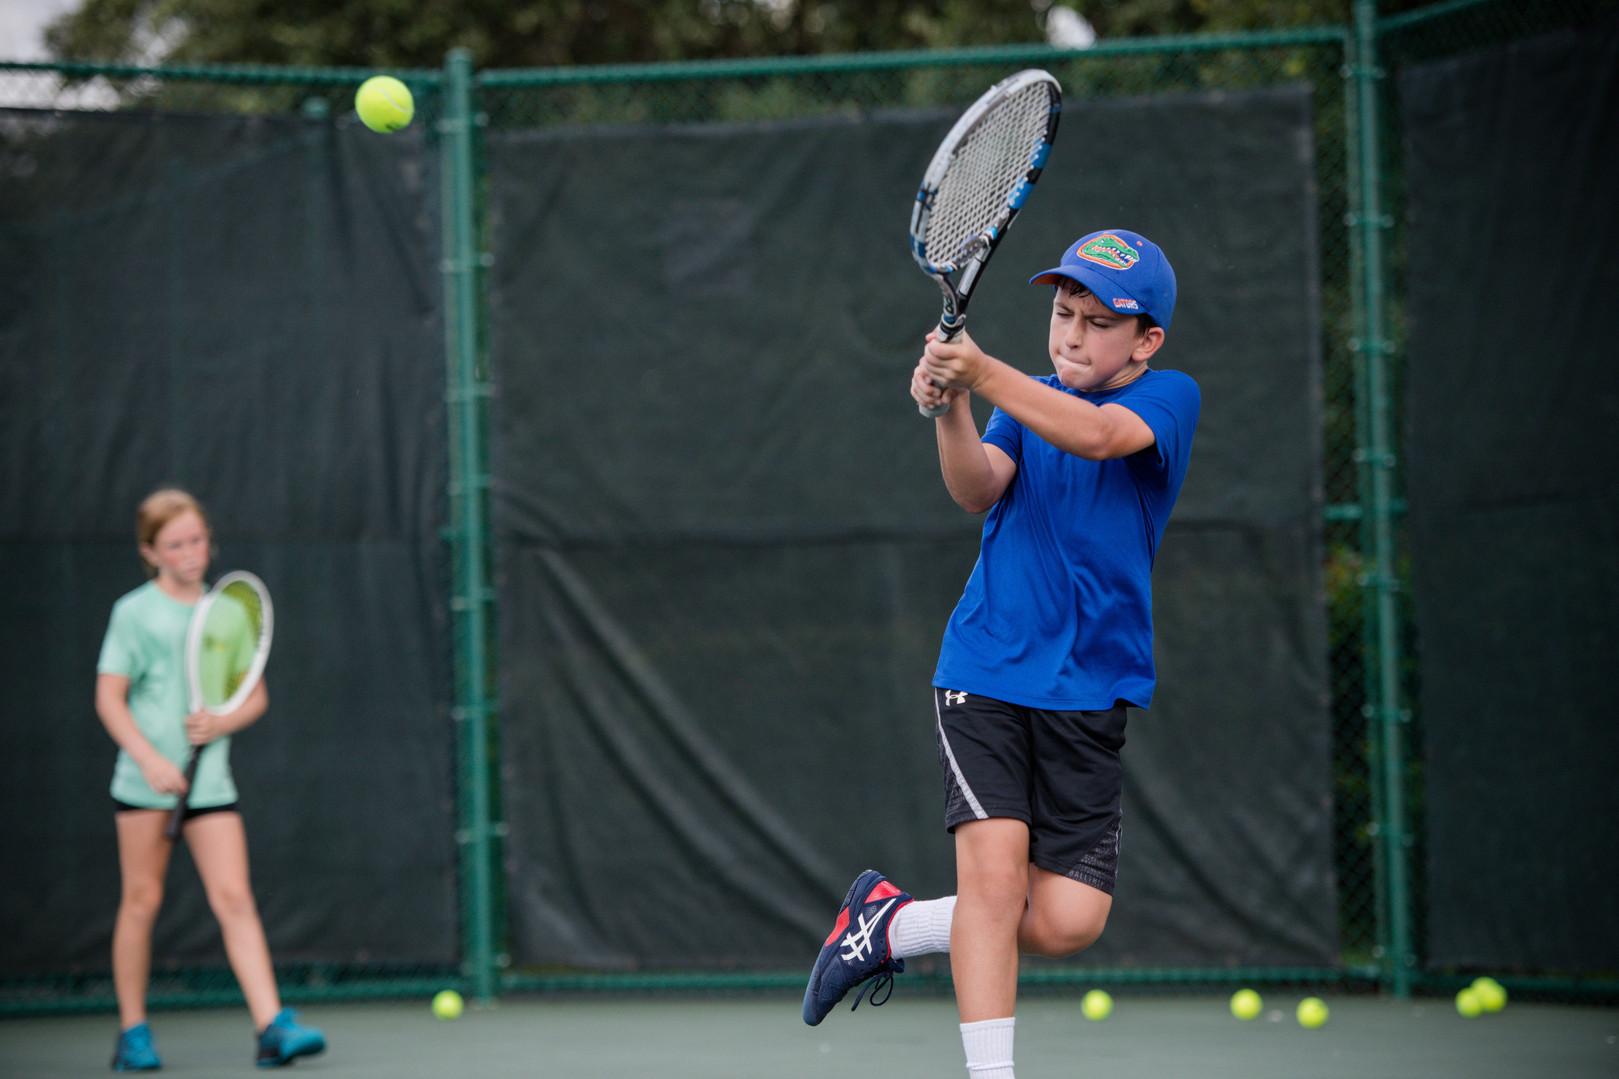 Tennis_Youth_20200724_0565.jpg